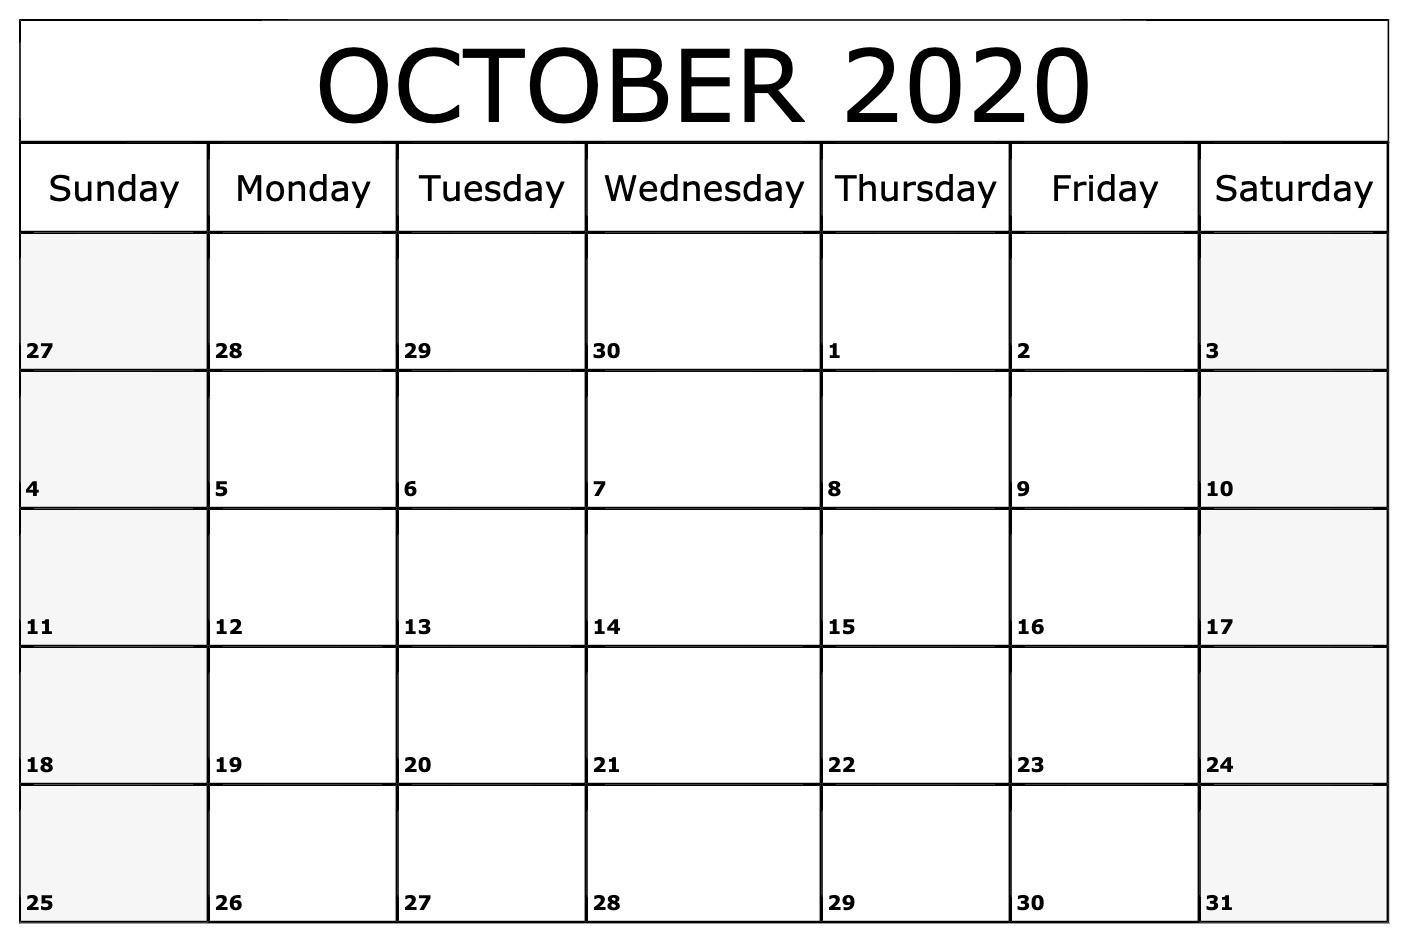 October Calendar 2020 | Calendar 2020-Free Printable Blank October 2020 Calendar Jewish Holidays